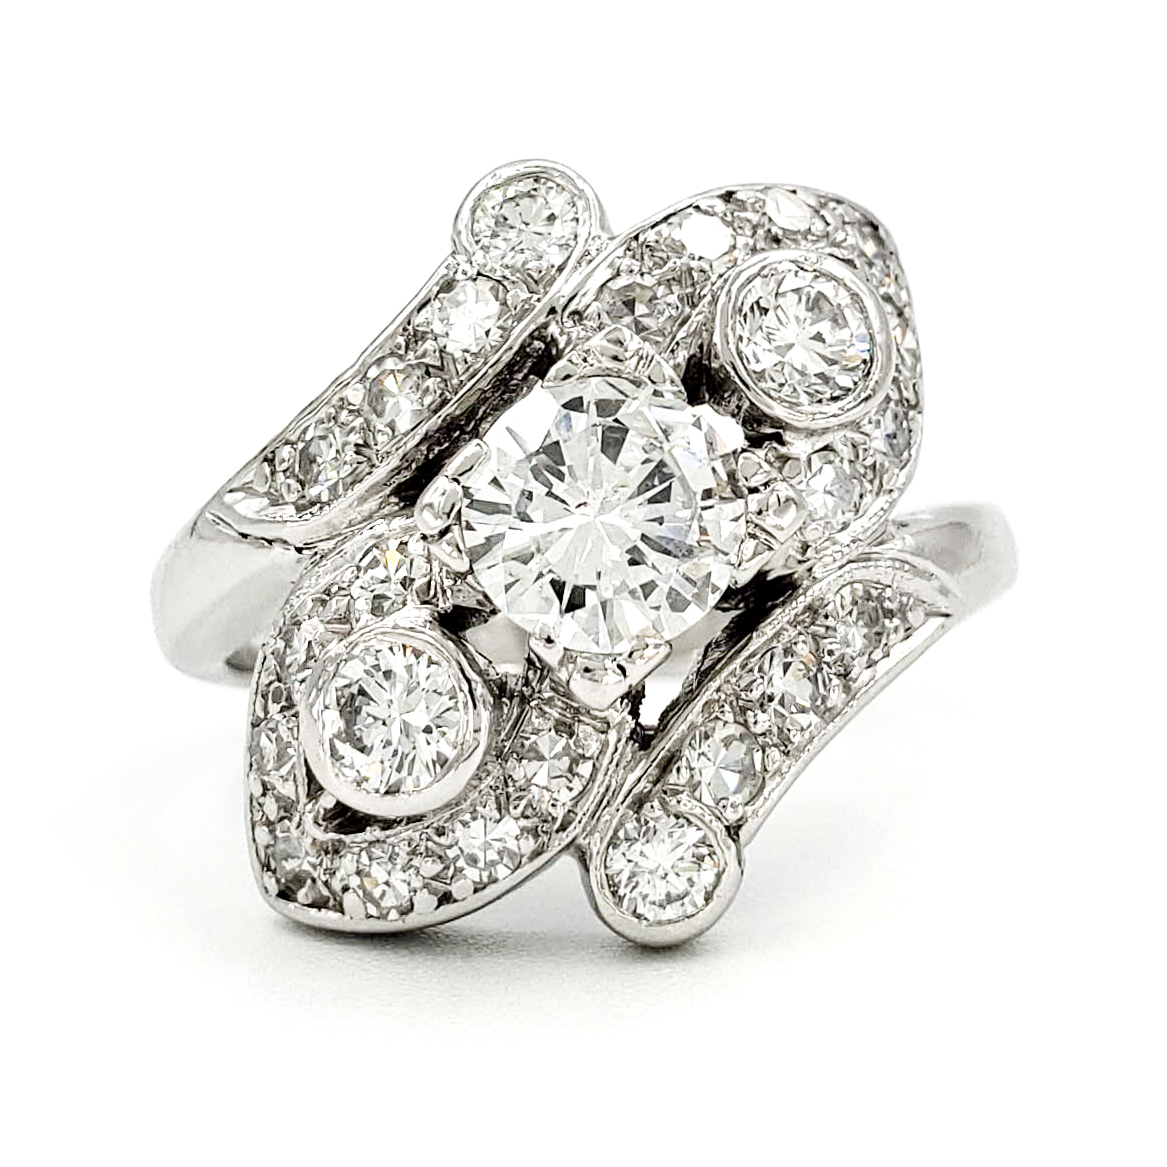 vintage-platinum-engagement-ring-with-0-58-carat-round-brilliant-cut-diamond-egl-e-si1